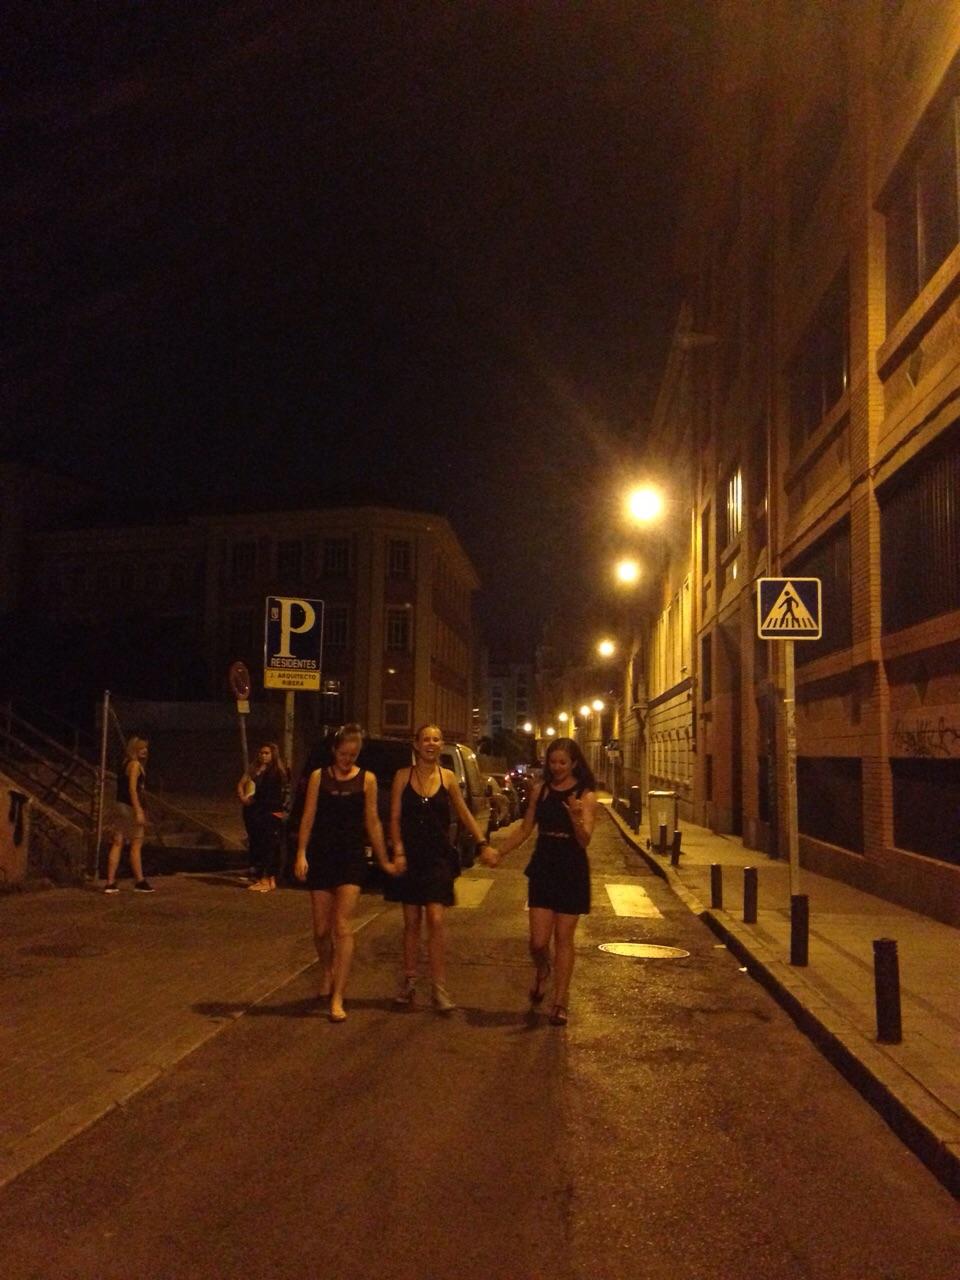 Girls walking down the street